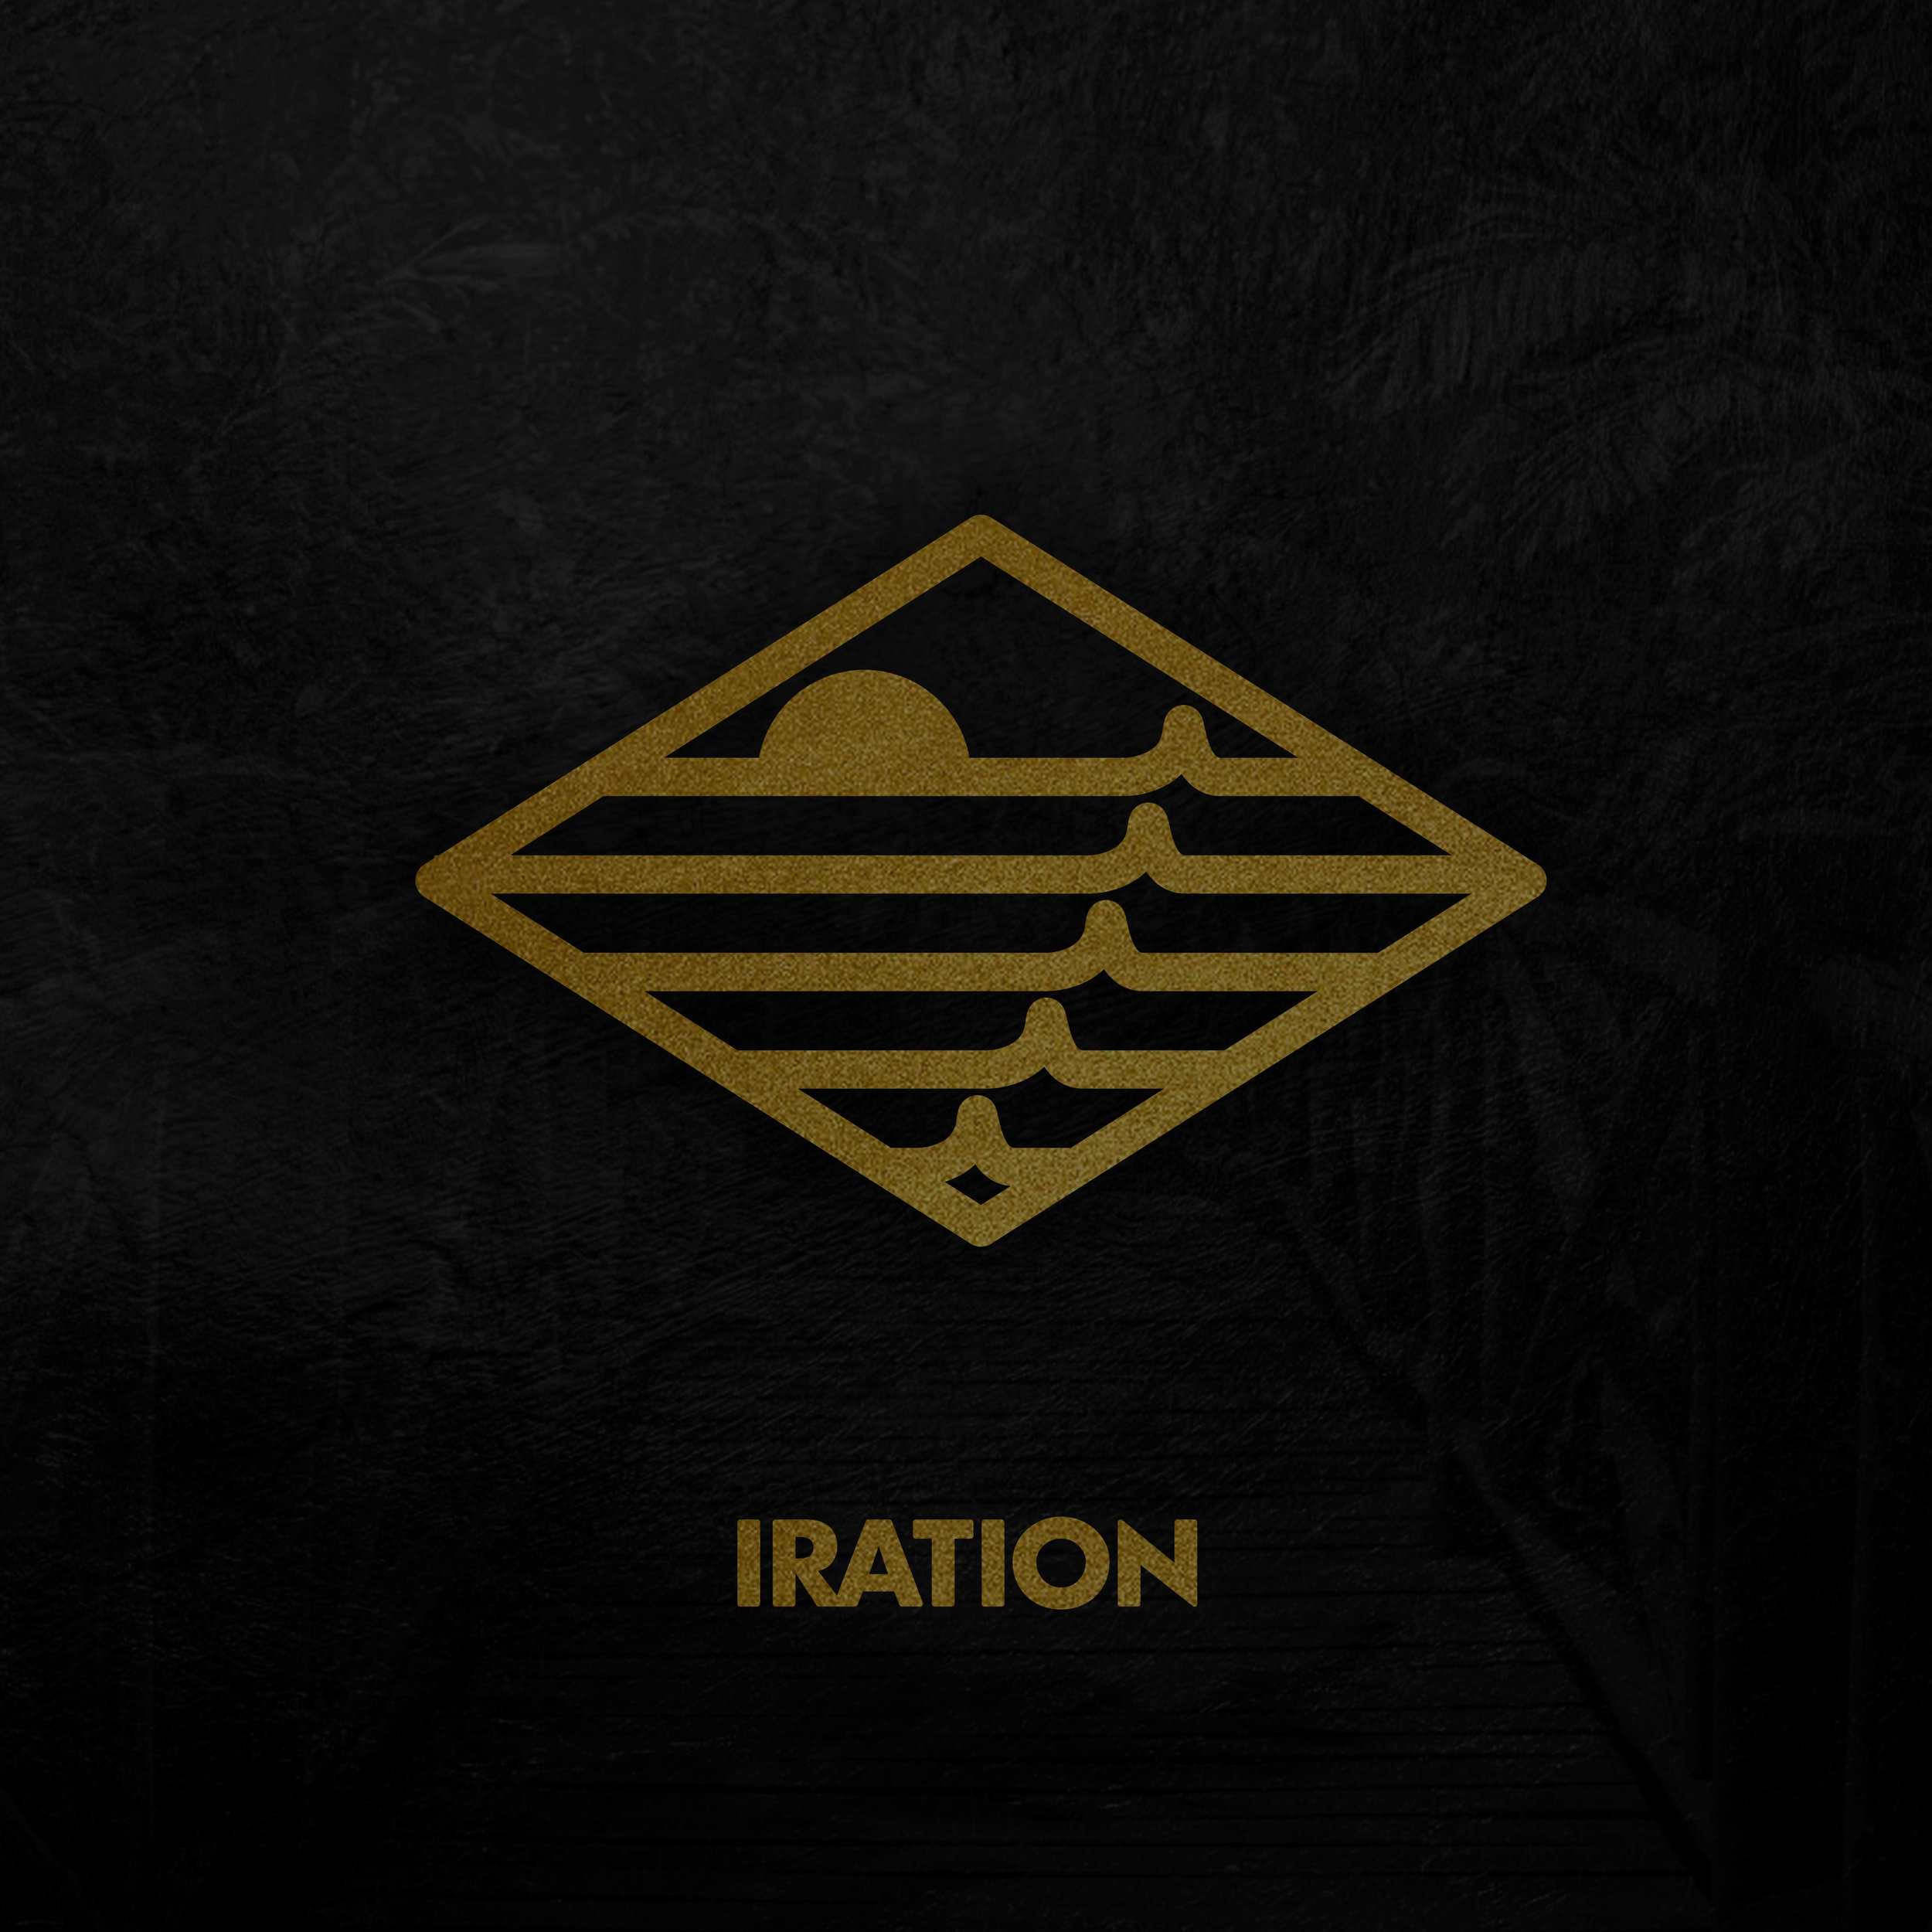 IRATION_SELF-TITLED_CD-COVER_DIGITAL_FINAL.jpg